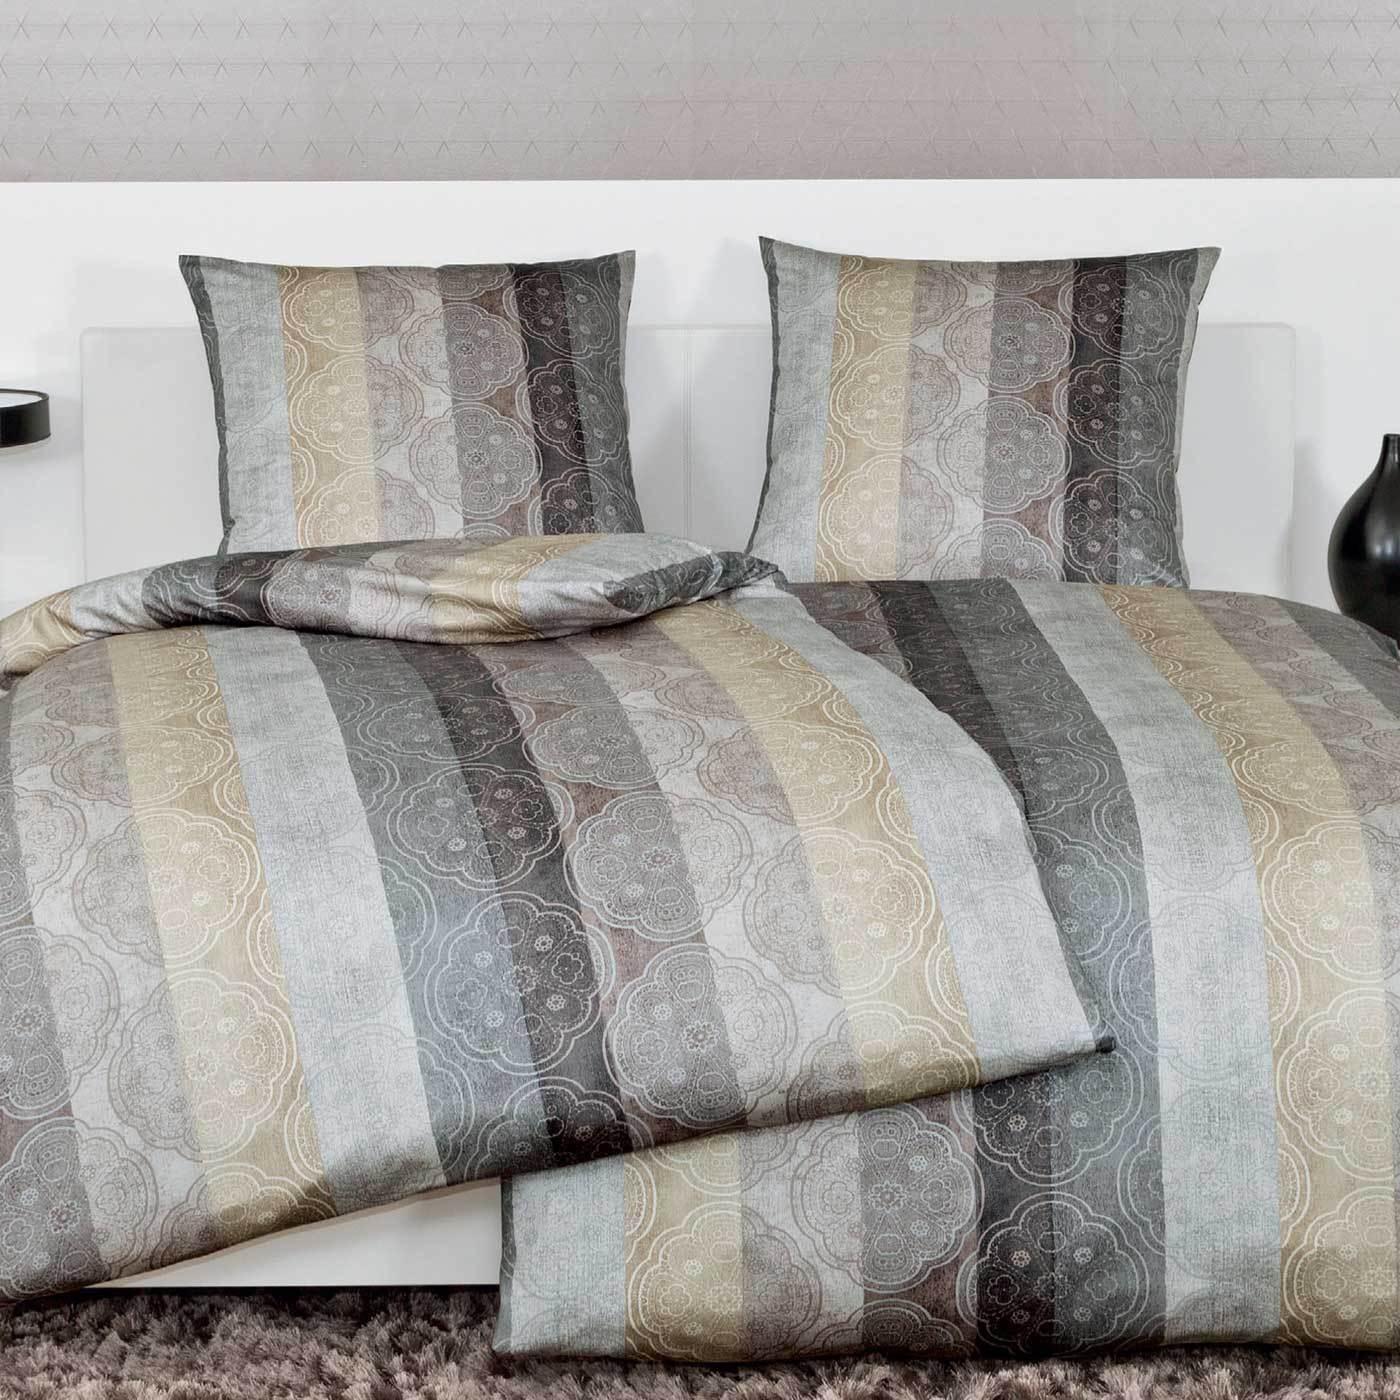 Постельное белье 2 спальное евро Janine Messina 4720 taupe-kitt-silber